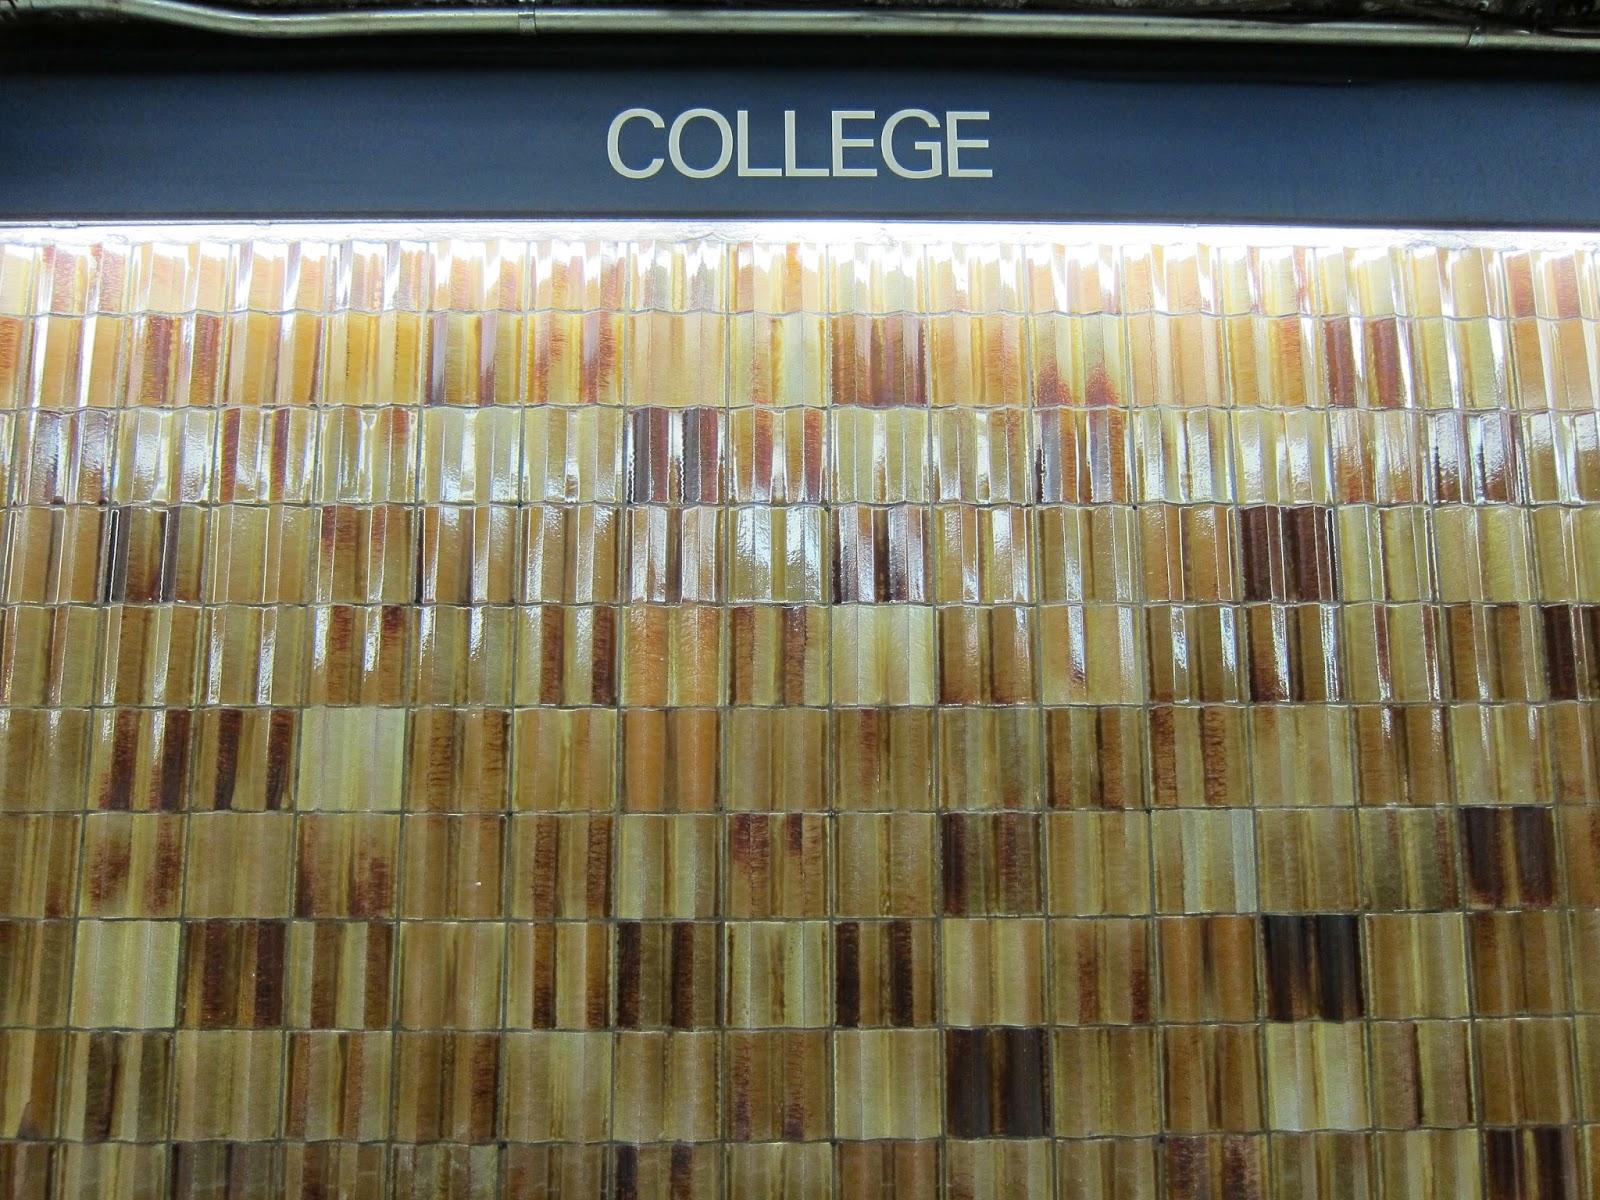 Tiling at College station